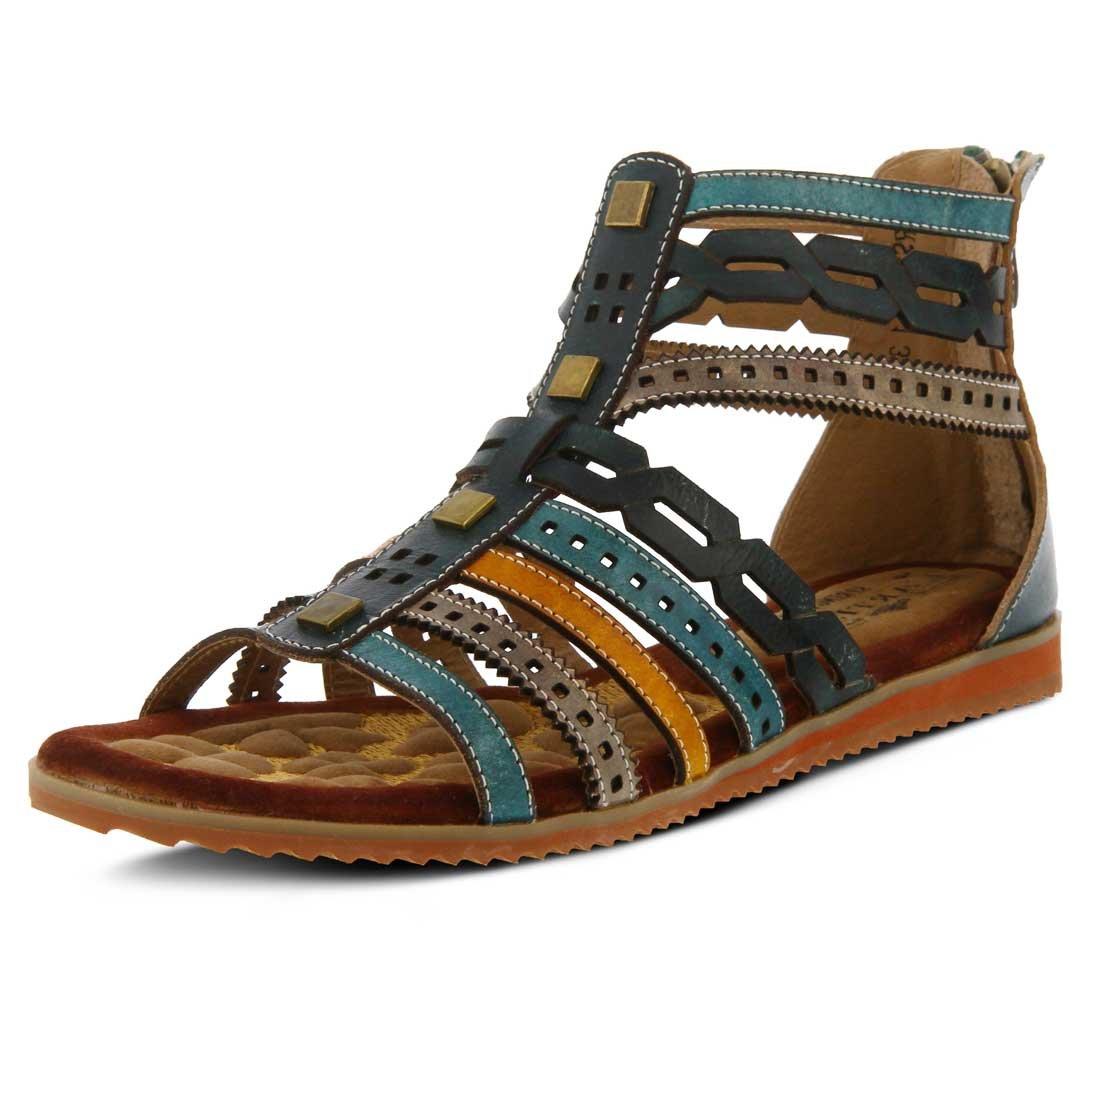 L'Artiste by Spring Step Women's Anjula Sandals B01N1H7SOB 40 M EU Teal